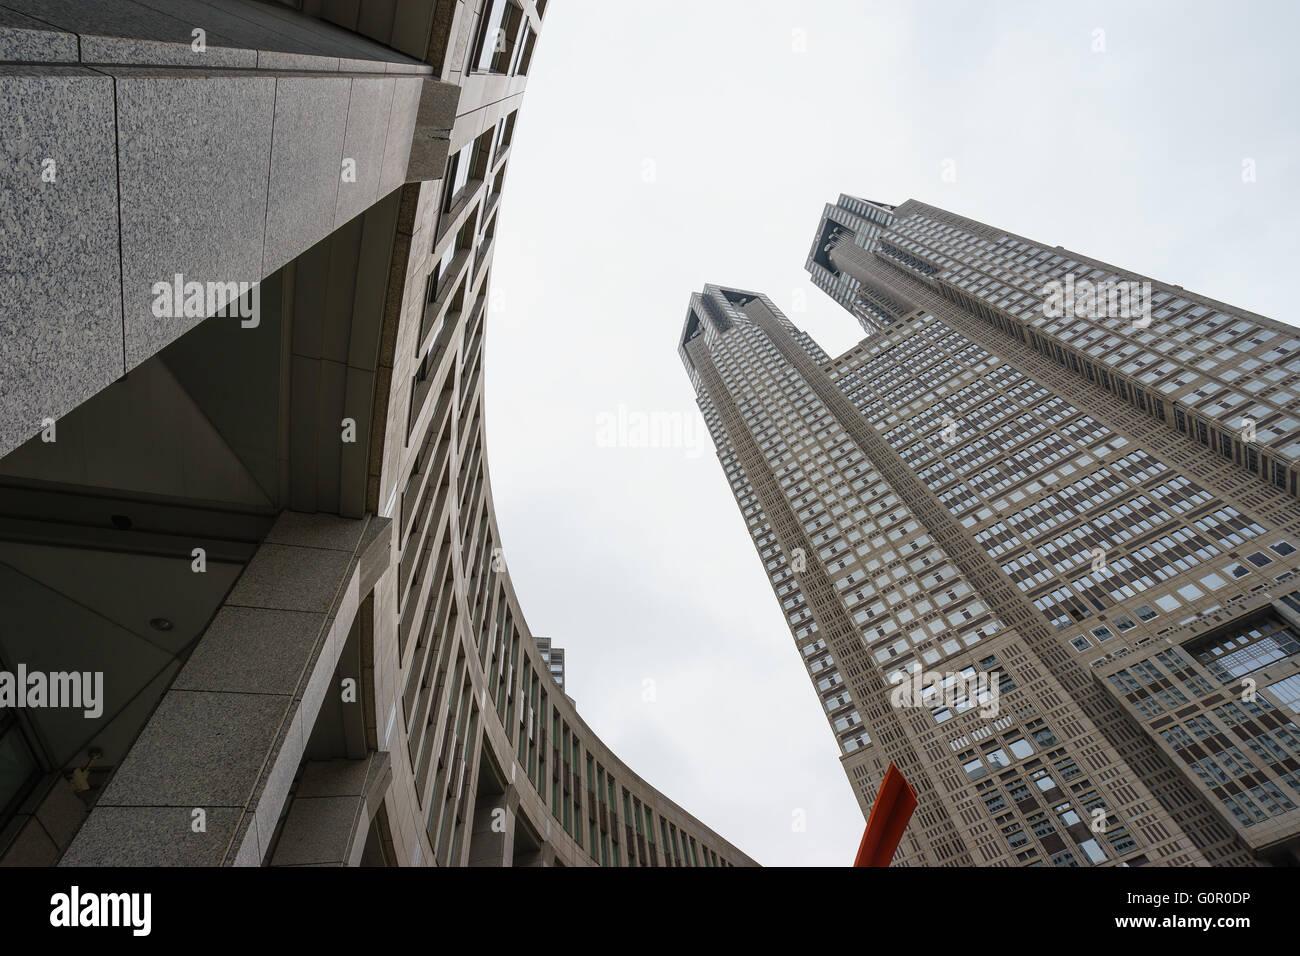 Tokyo Metropolitan Government Building, Shinjuku, Tokyo, Japon. Photo Stock